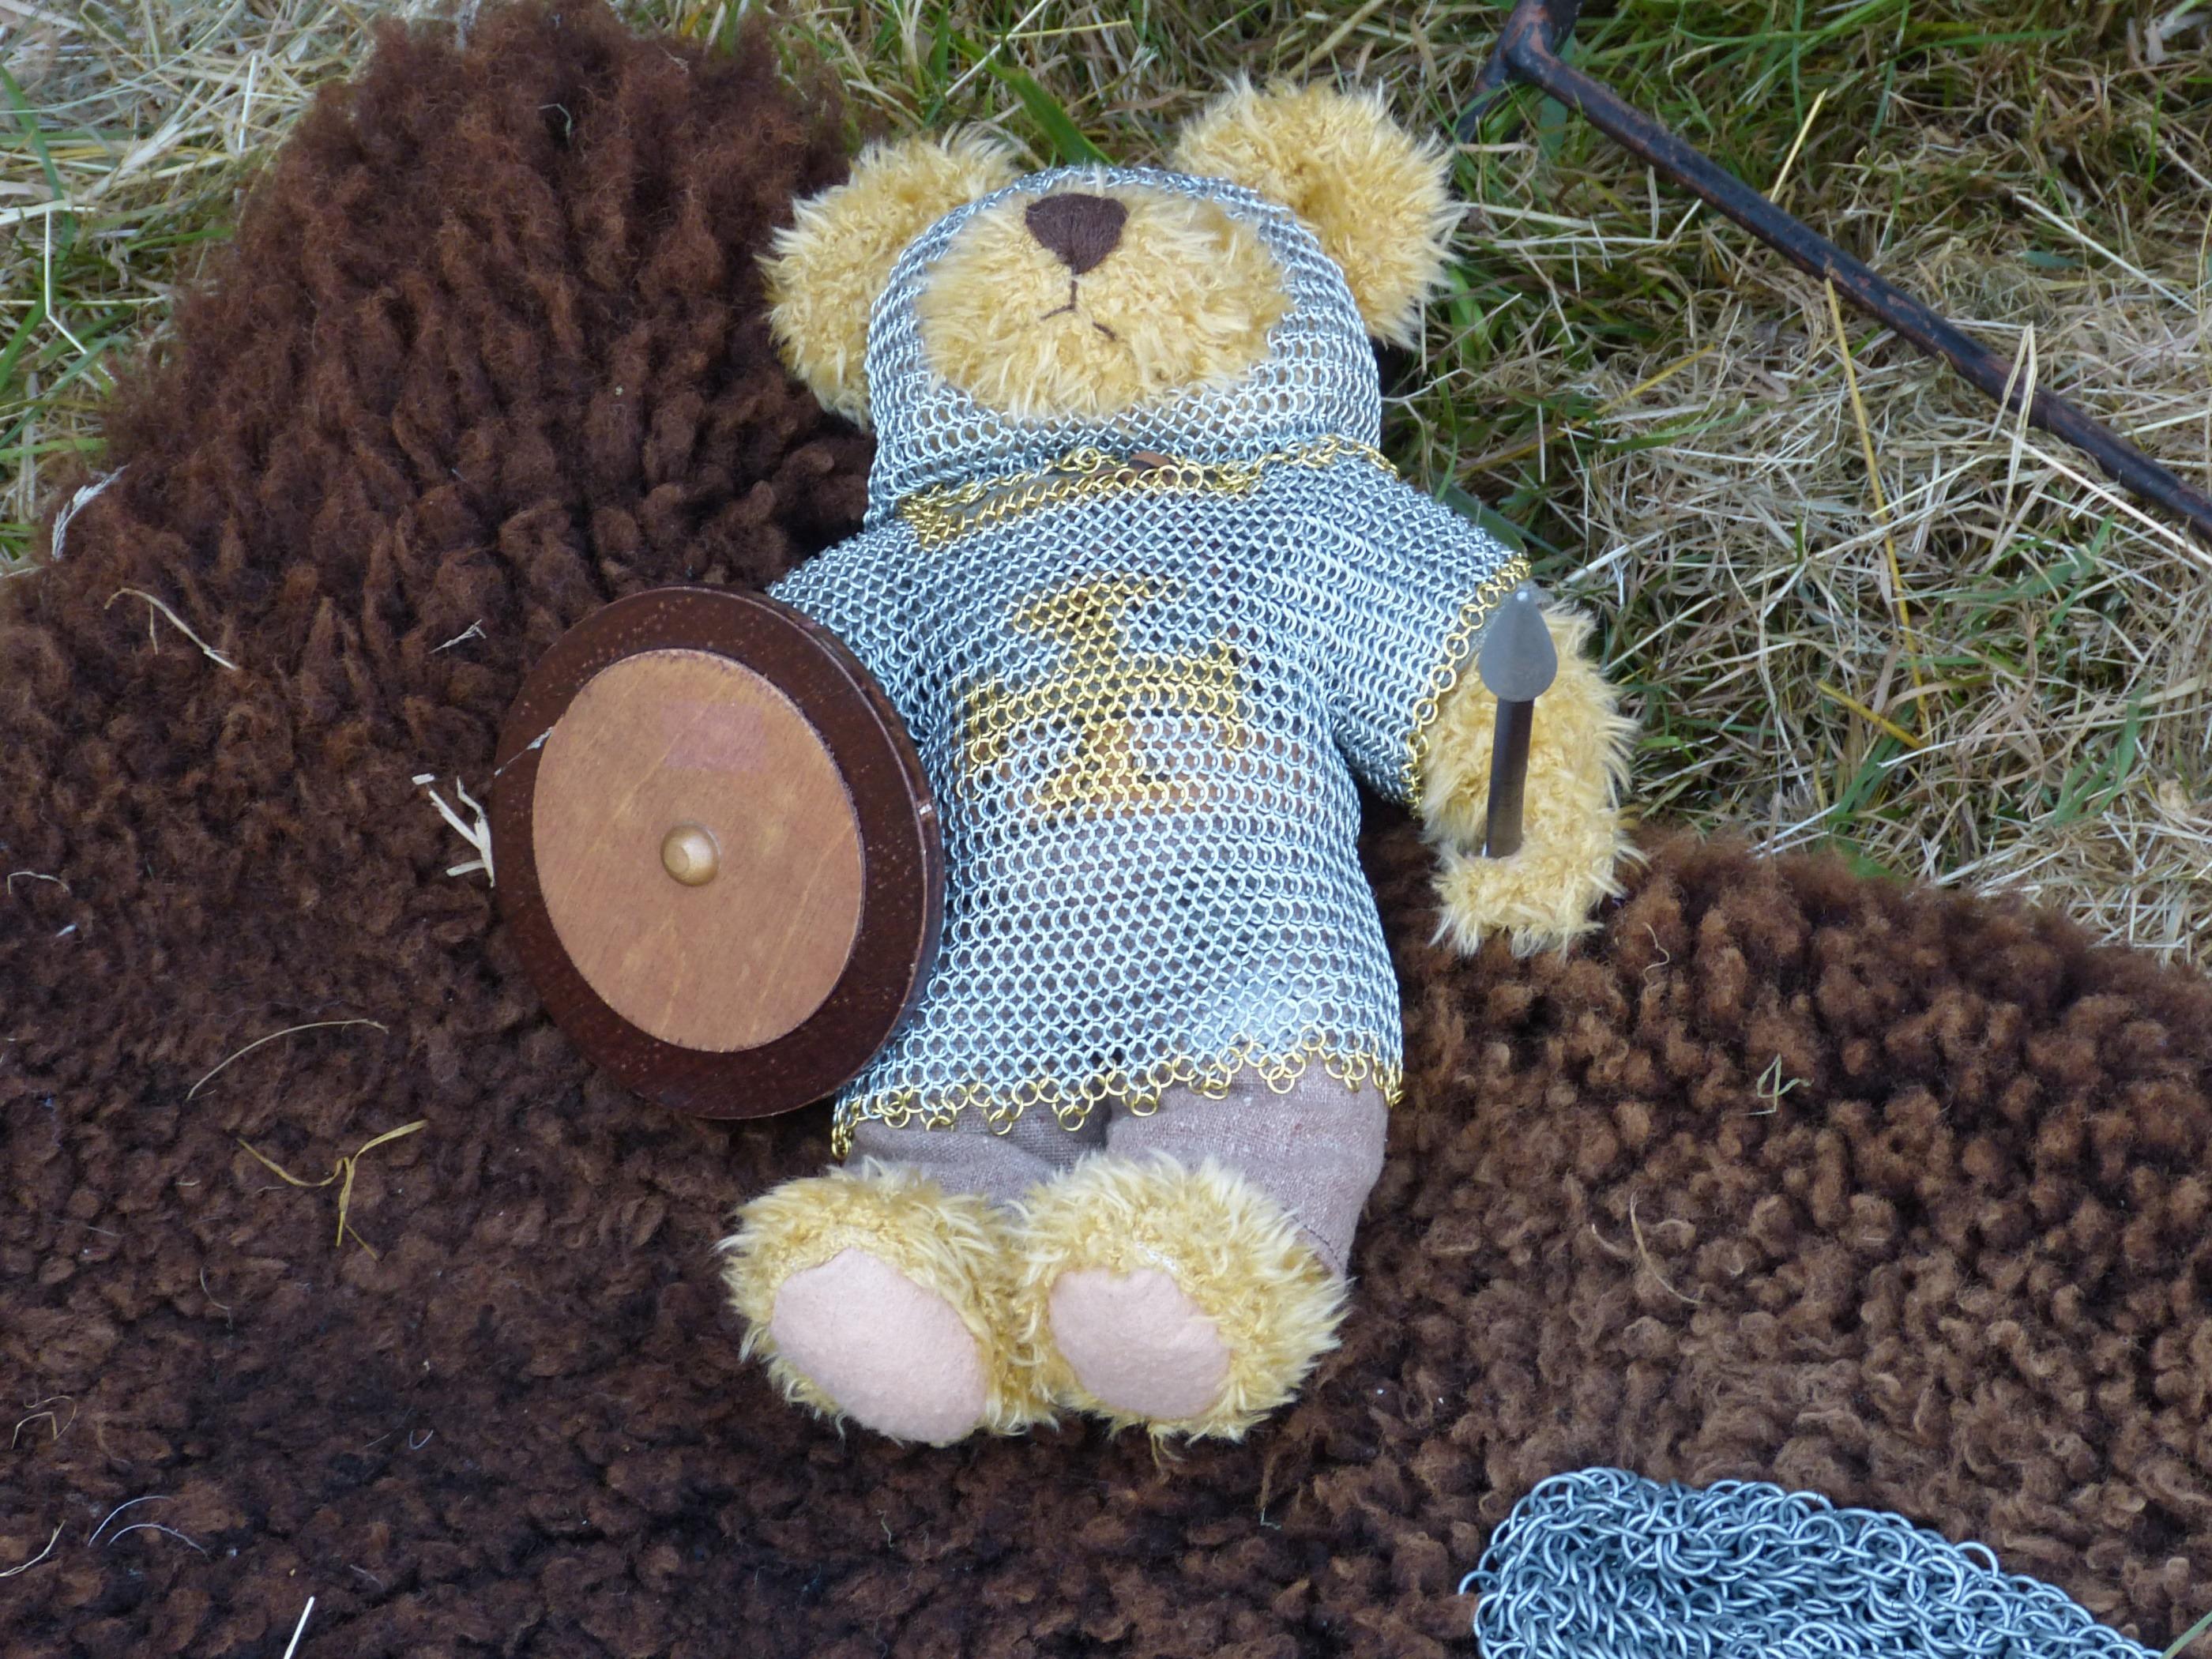 Fotos gratis : jugar, flor, agricultura, lana, oso de peluche, tejer ...